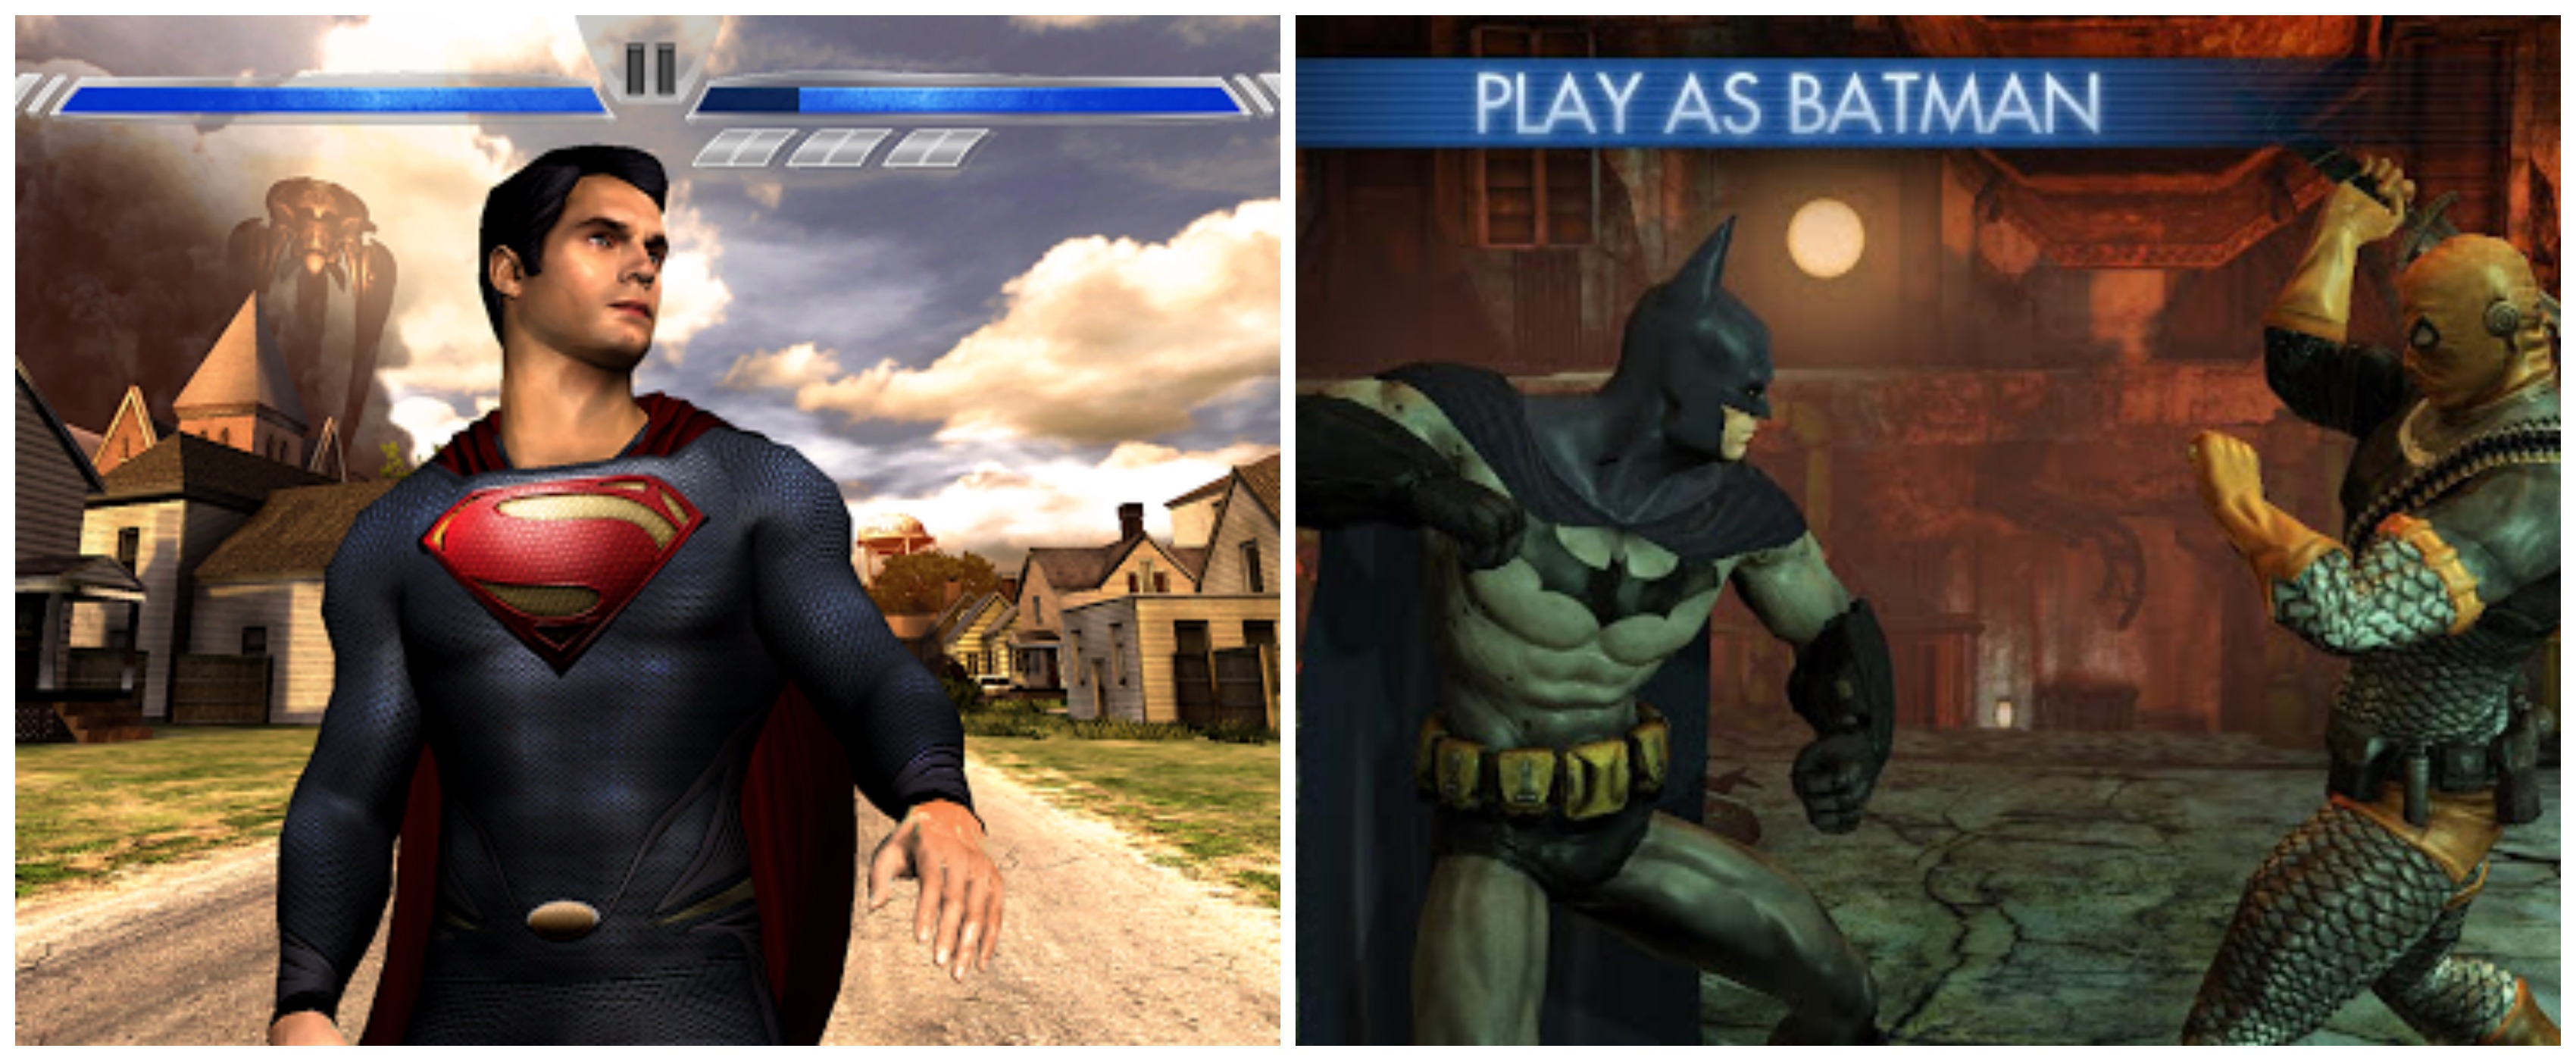 Man of Steel and Batman - Arkham City Lockdown